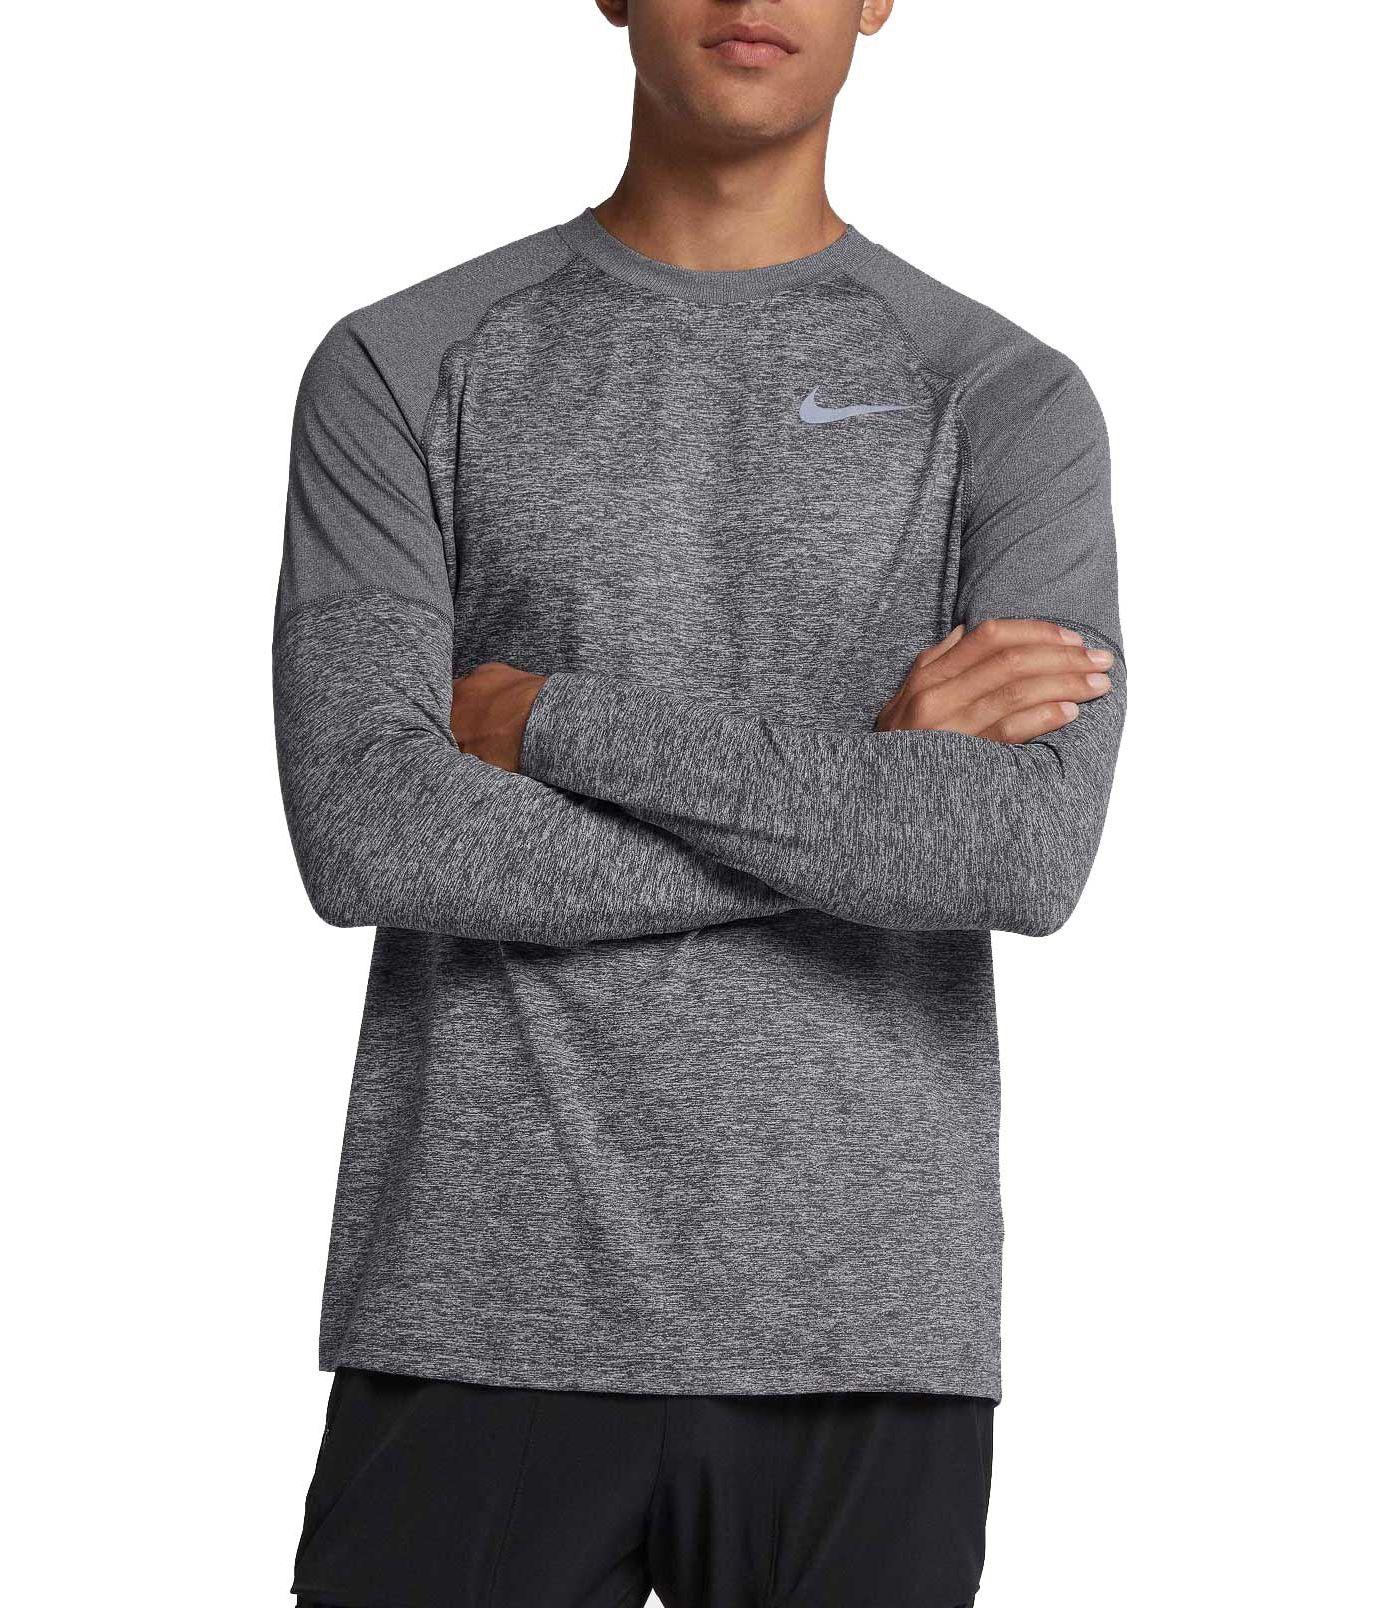 Nike Men's Element Crew Running Long Sleeve Tee